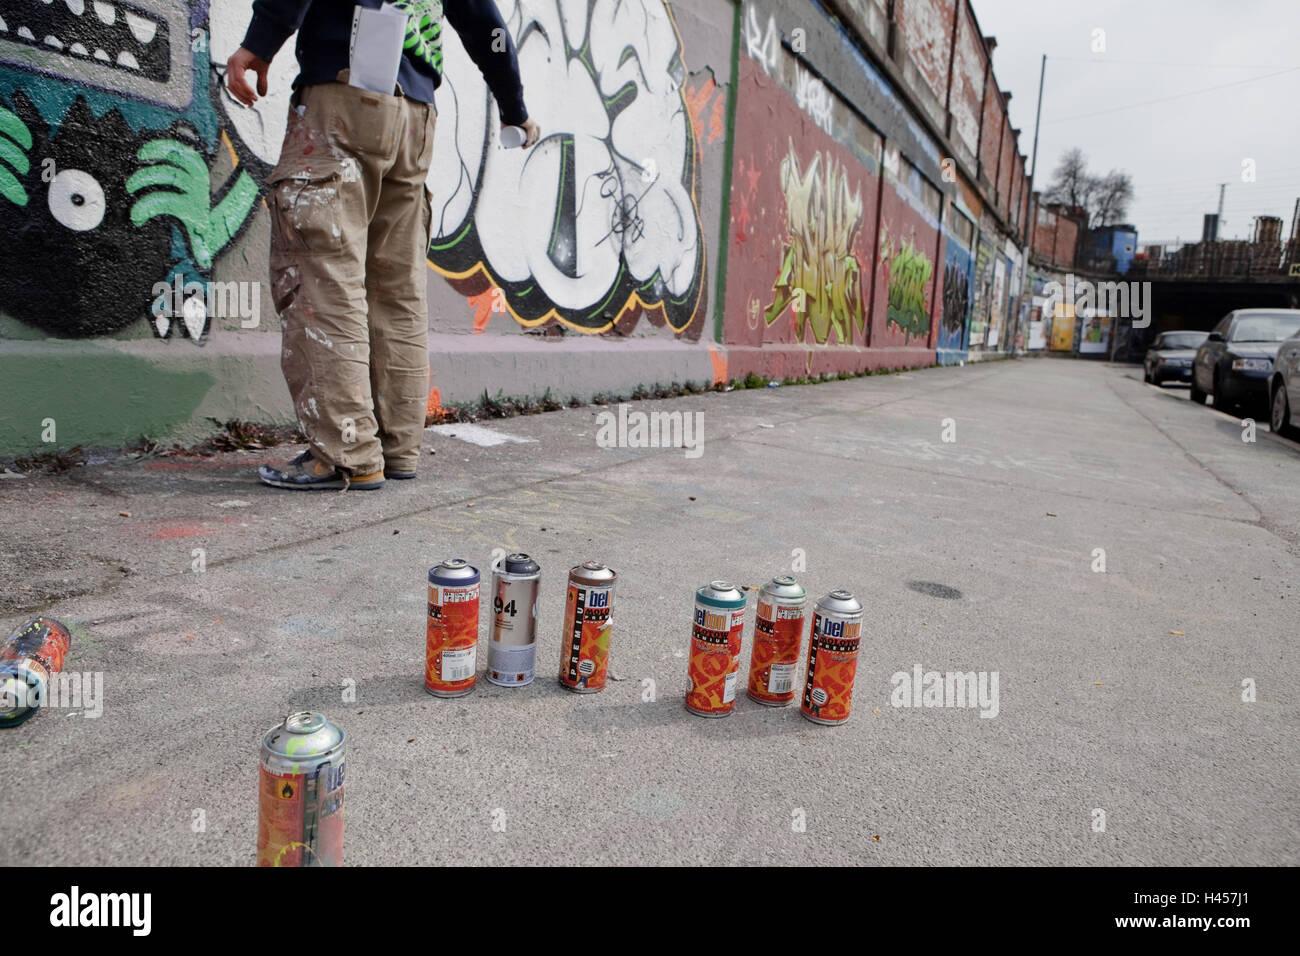 Sprayer, paint tins, wall, graffiti, - Stock Image